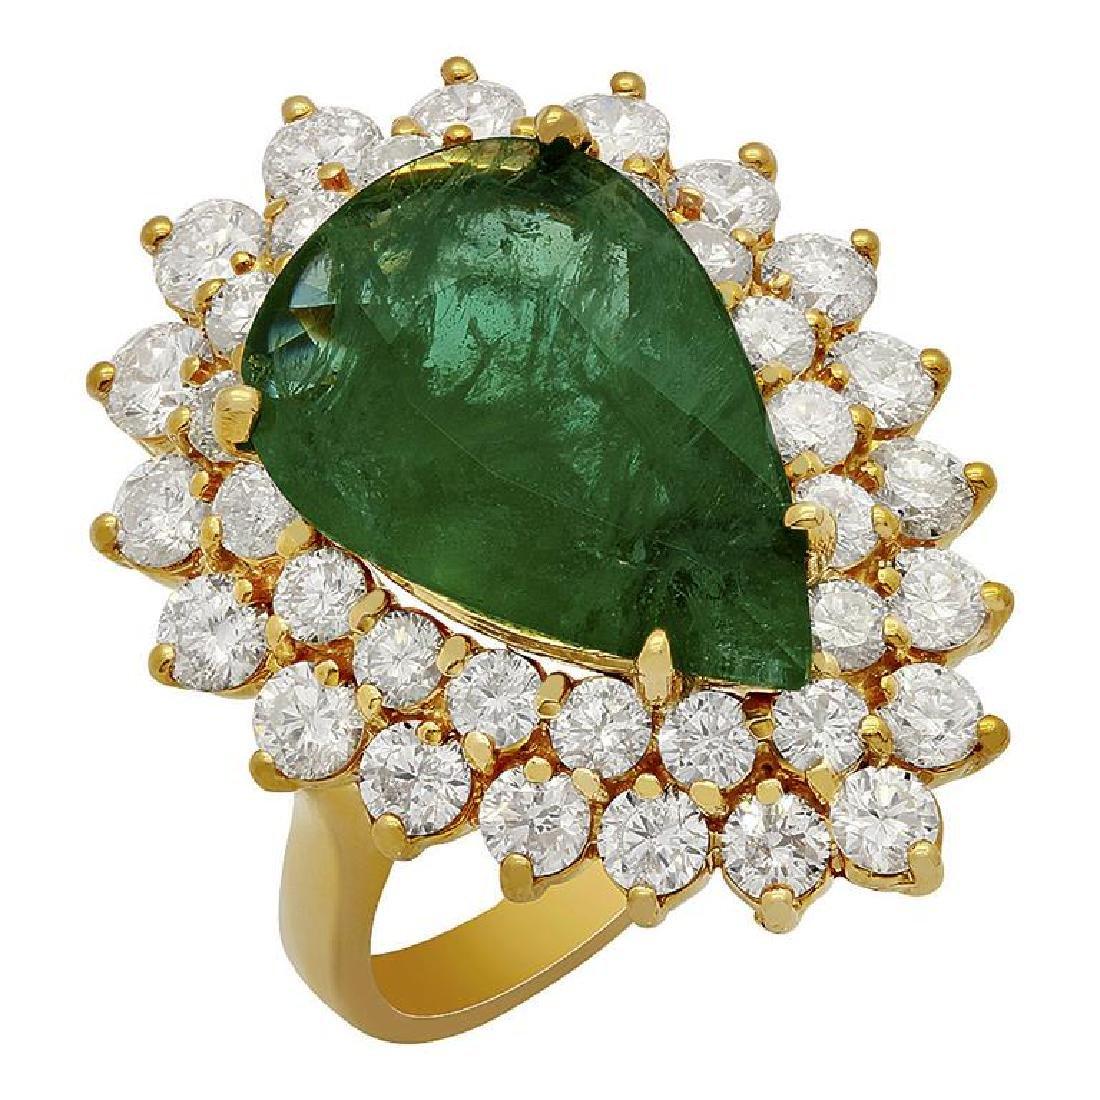 14k Yellow Gold 5.30ct Emerald 2.71ct Diamond Ring